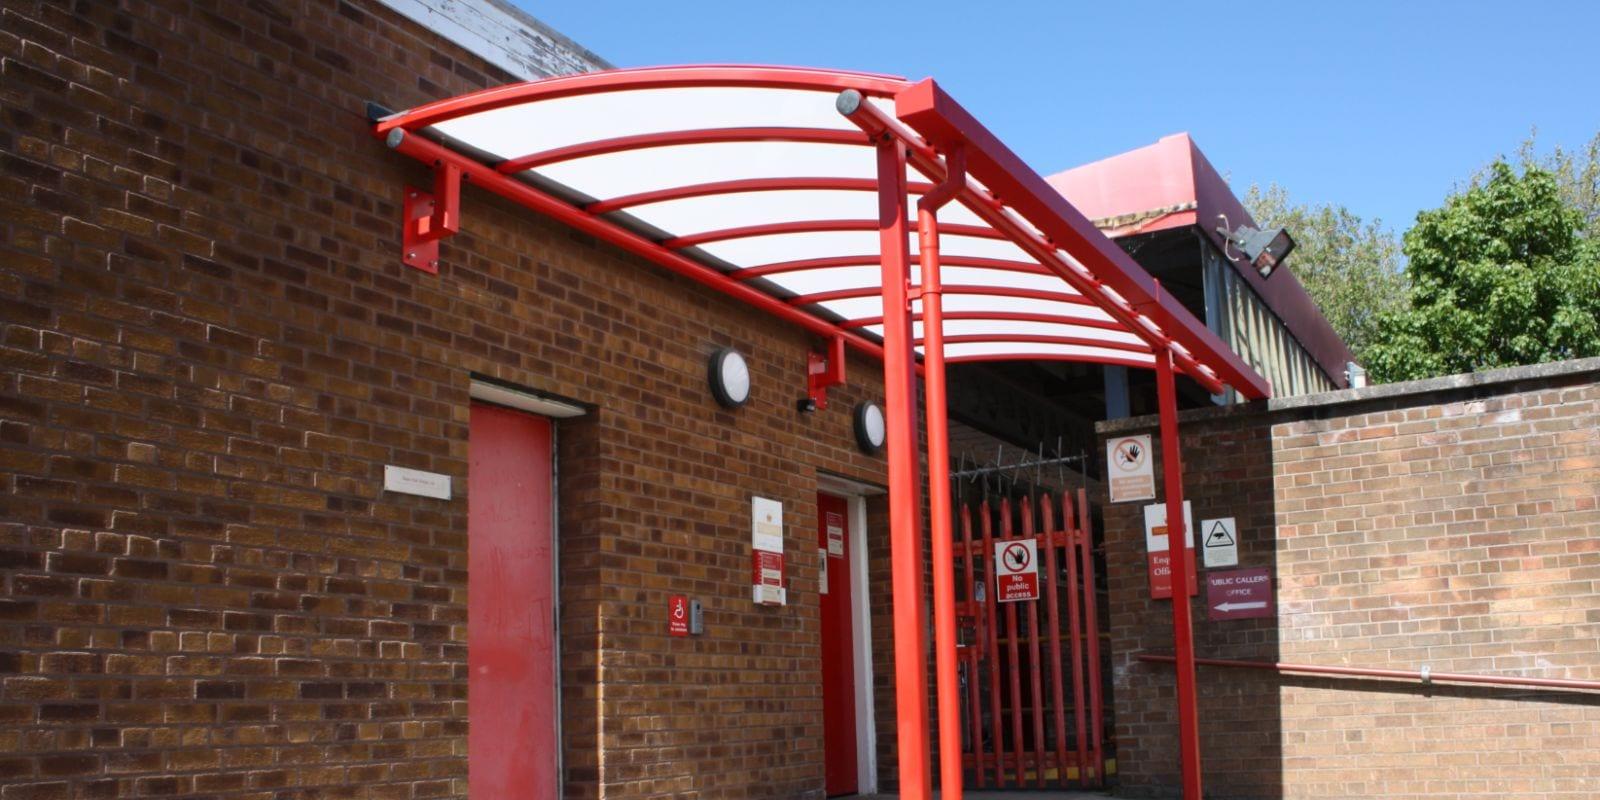 Curved roof shelter we installed at Royal Mail Middleton